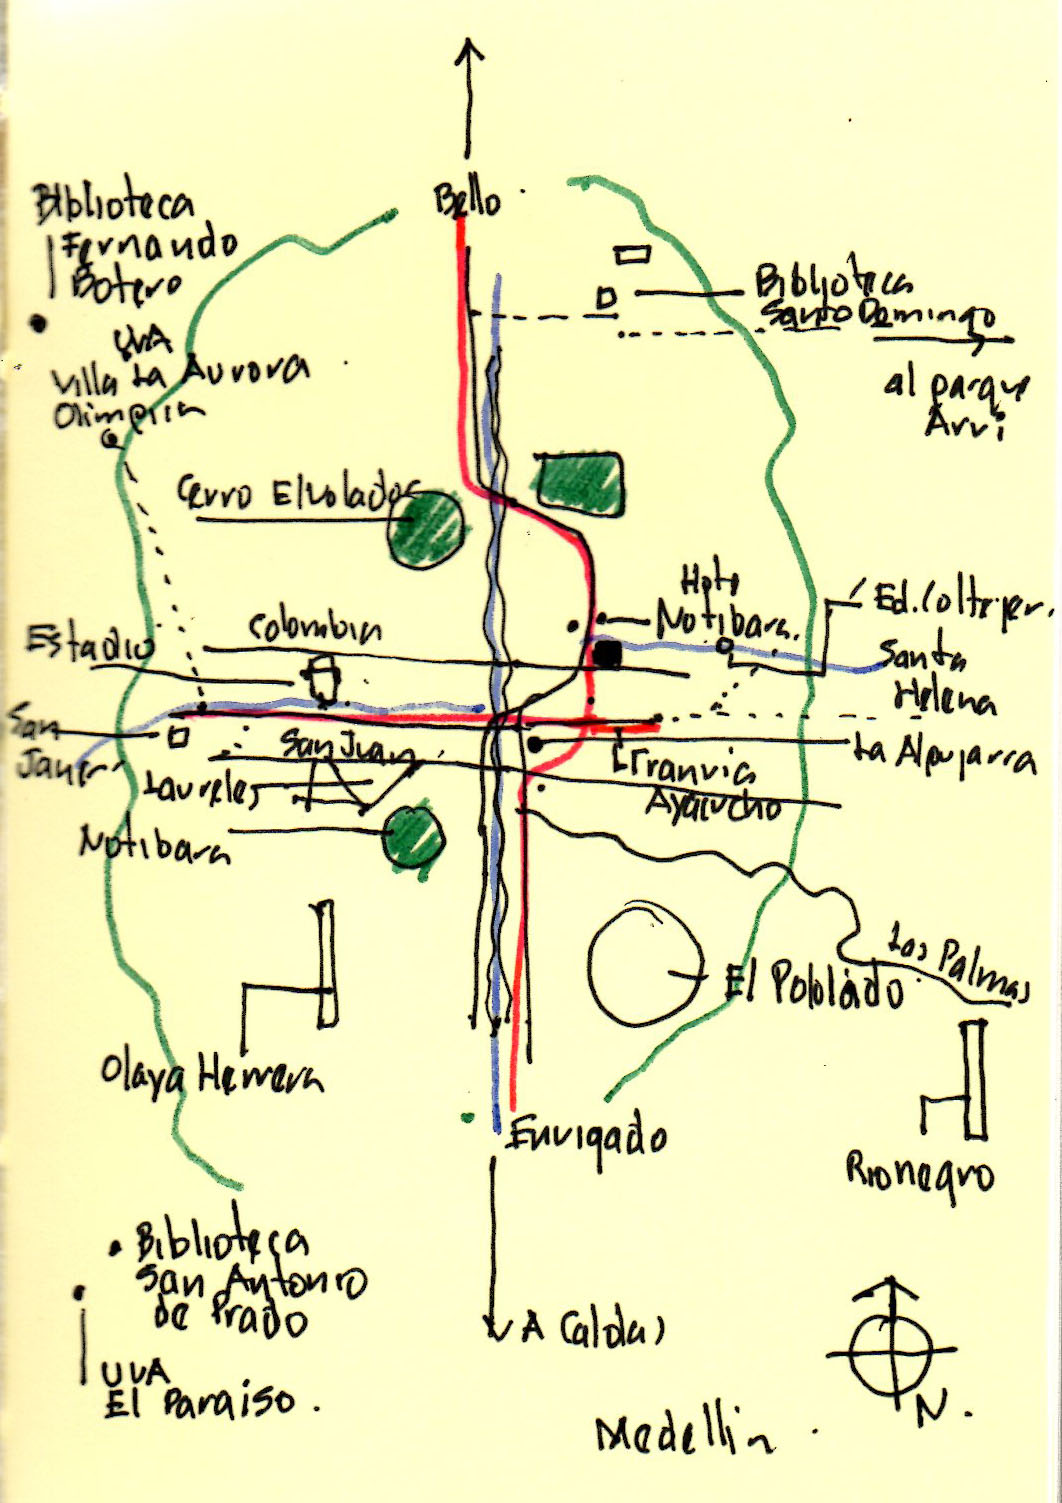 Plano esquemático de Medellín.